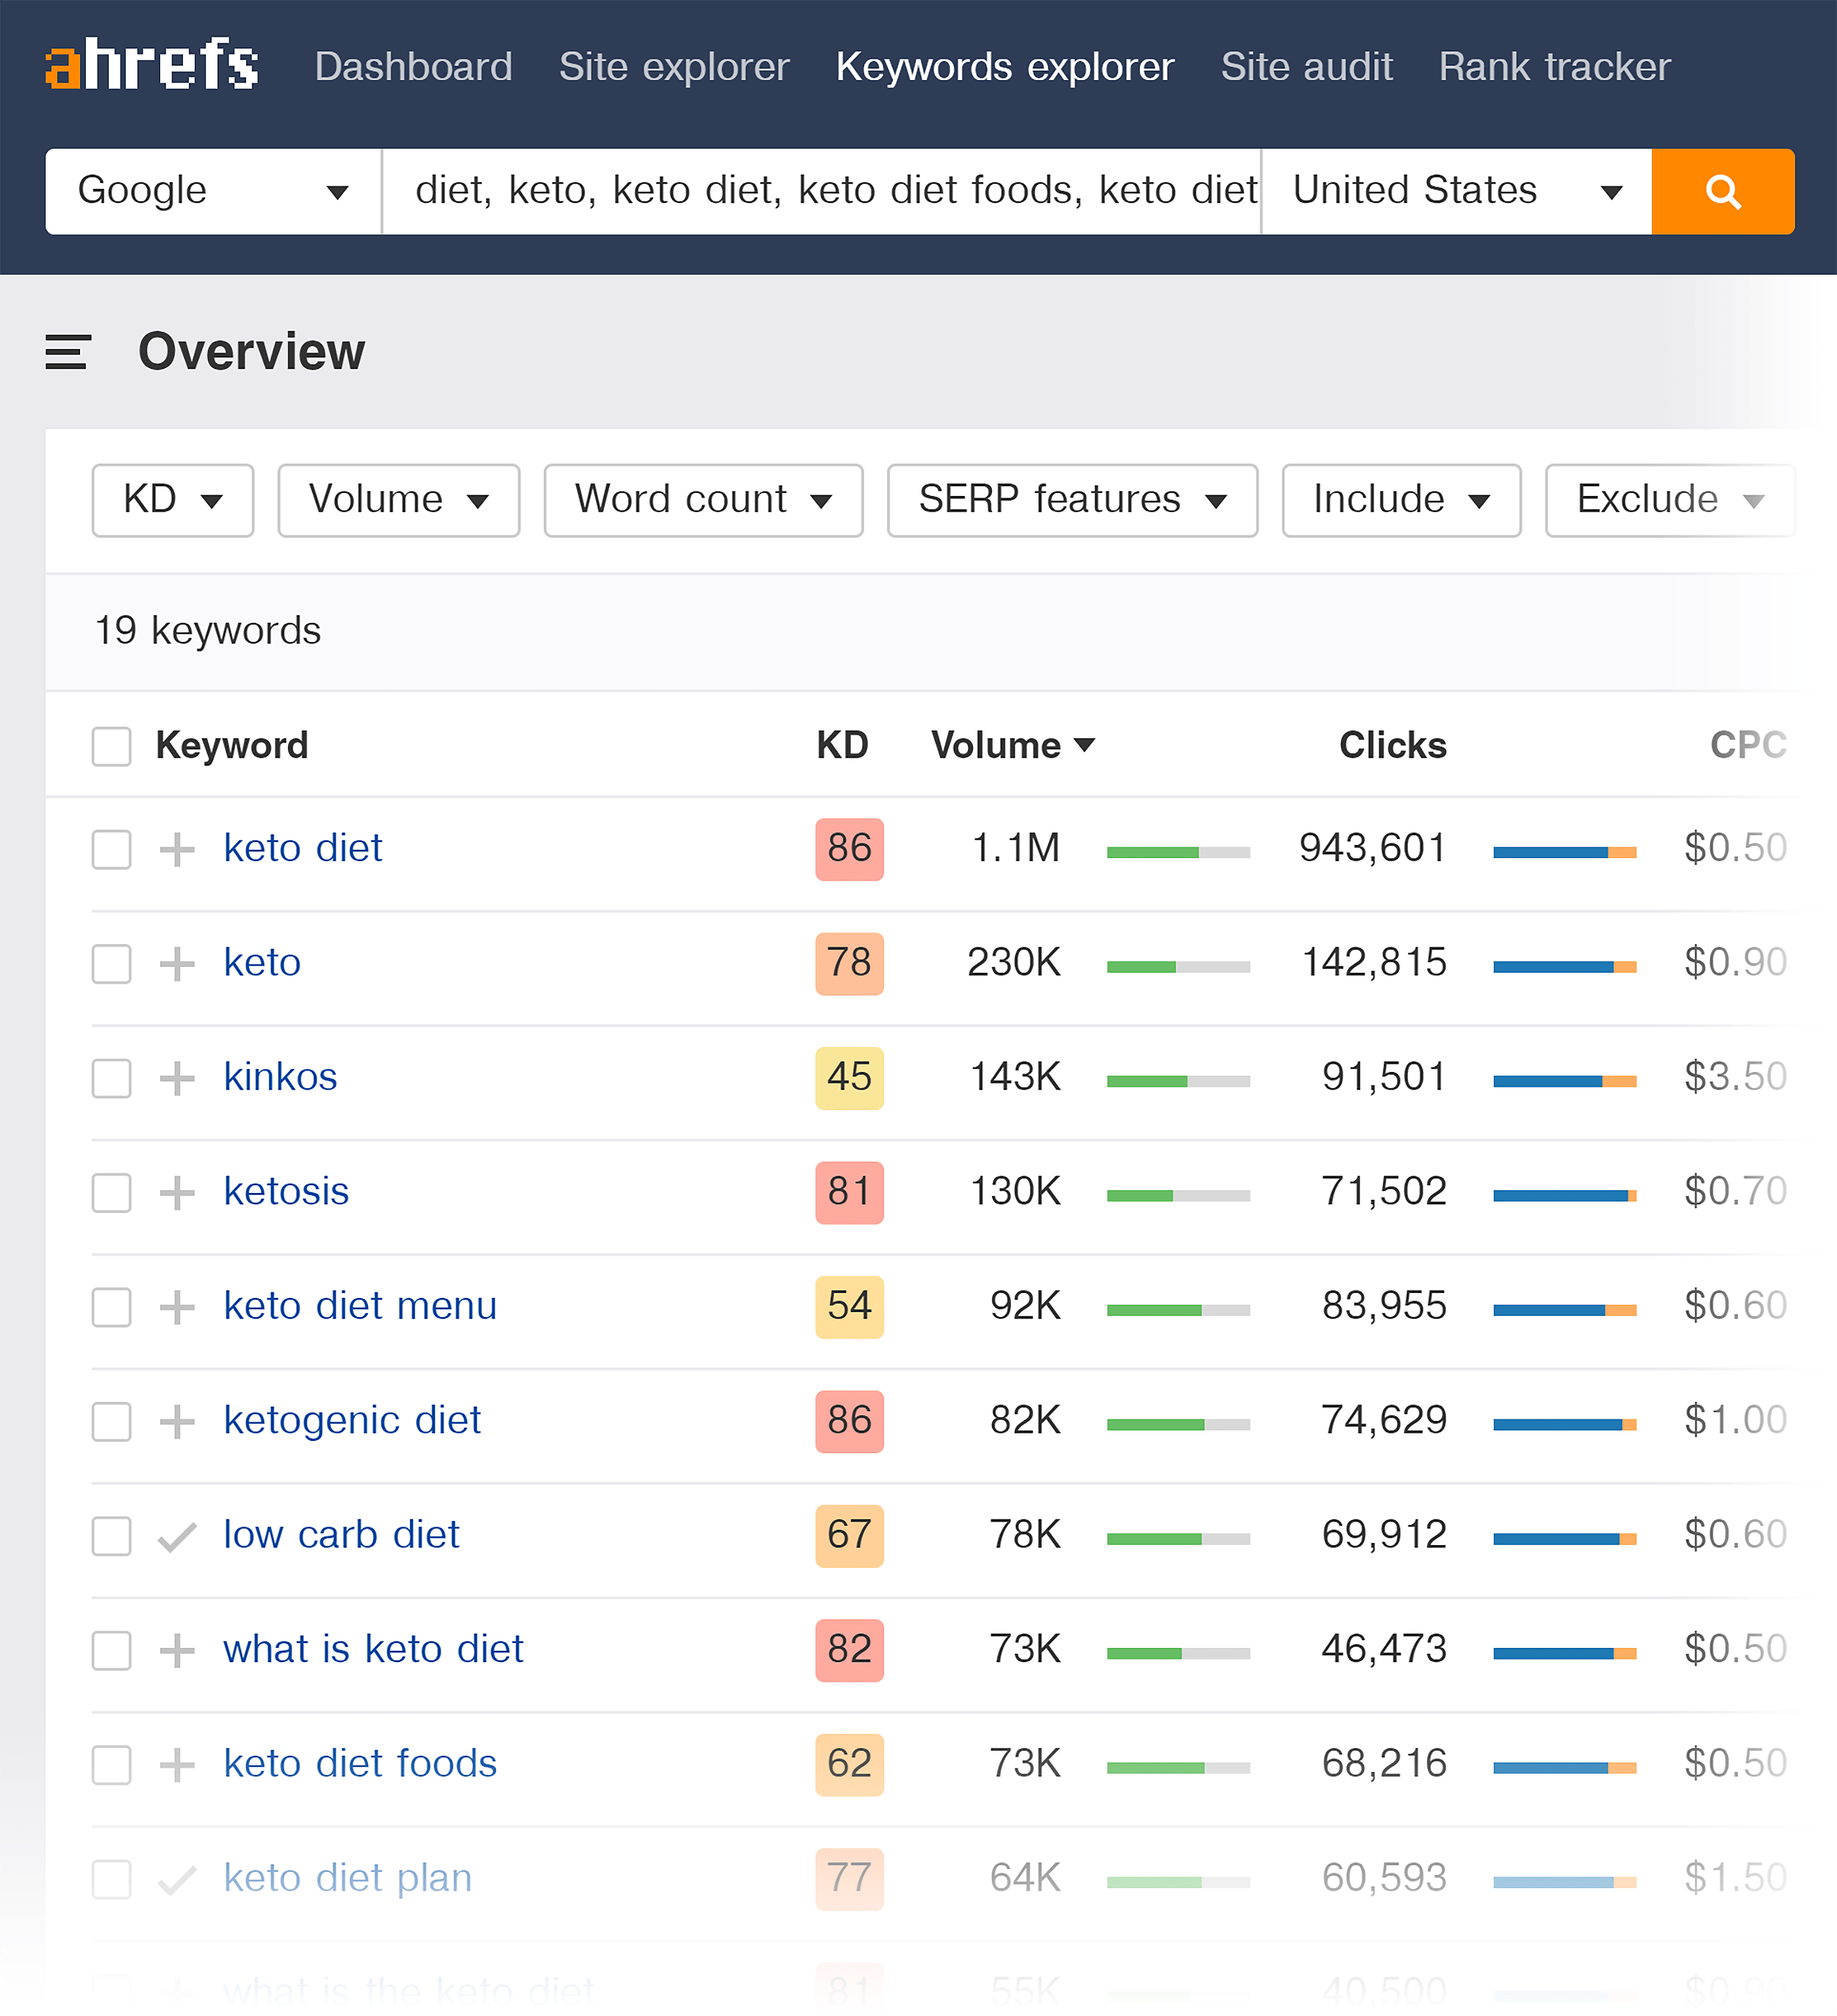 Ahrefs – Keywords explorer results